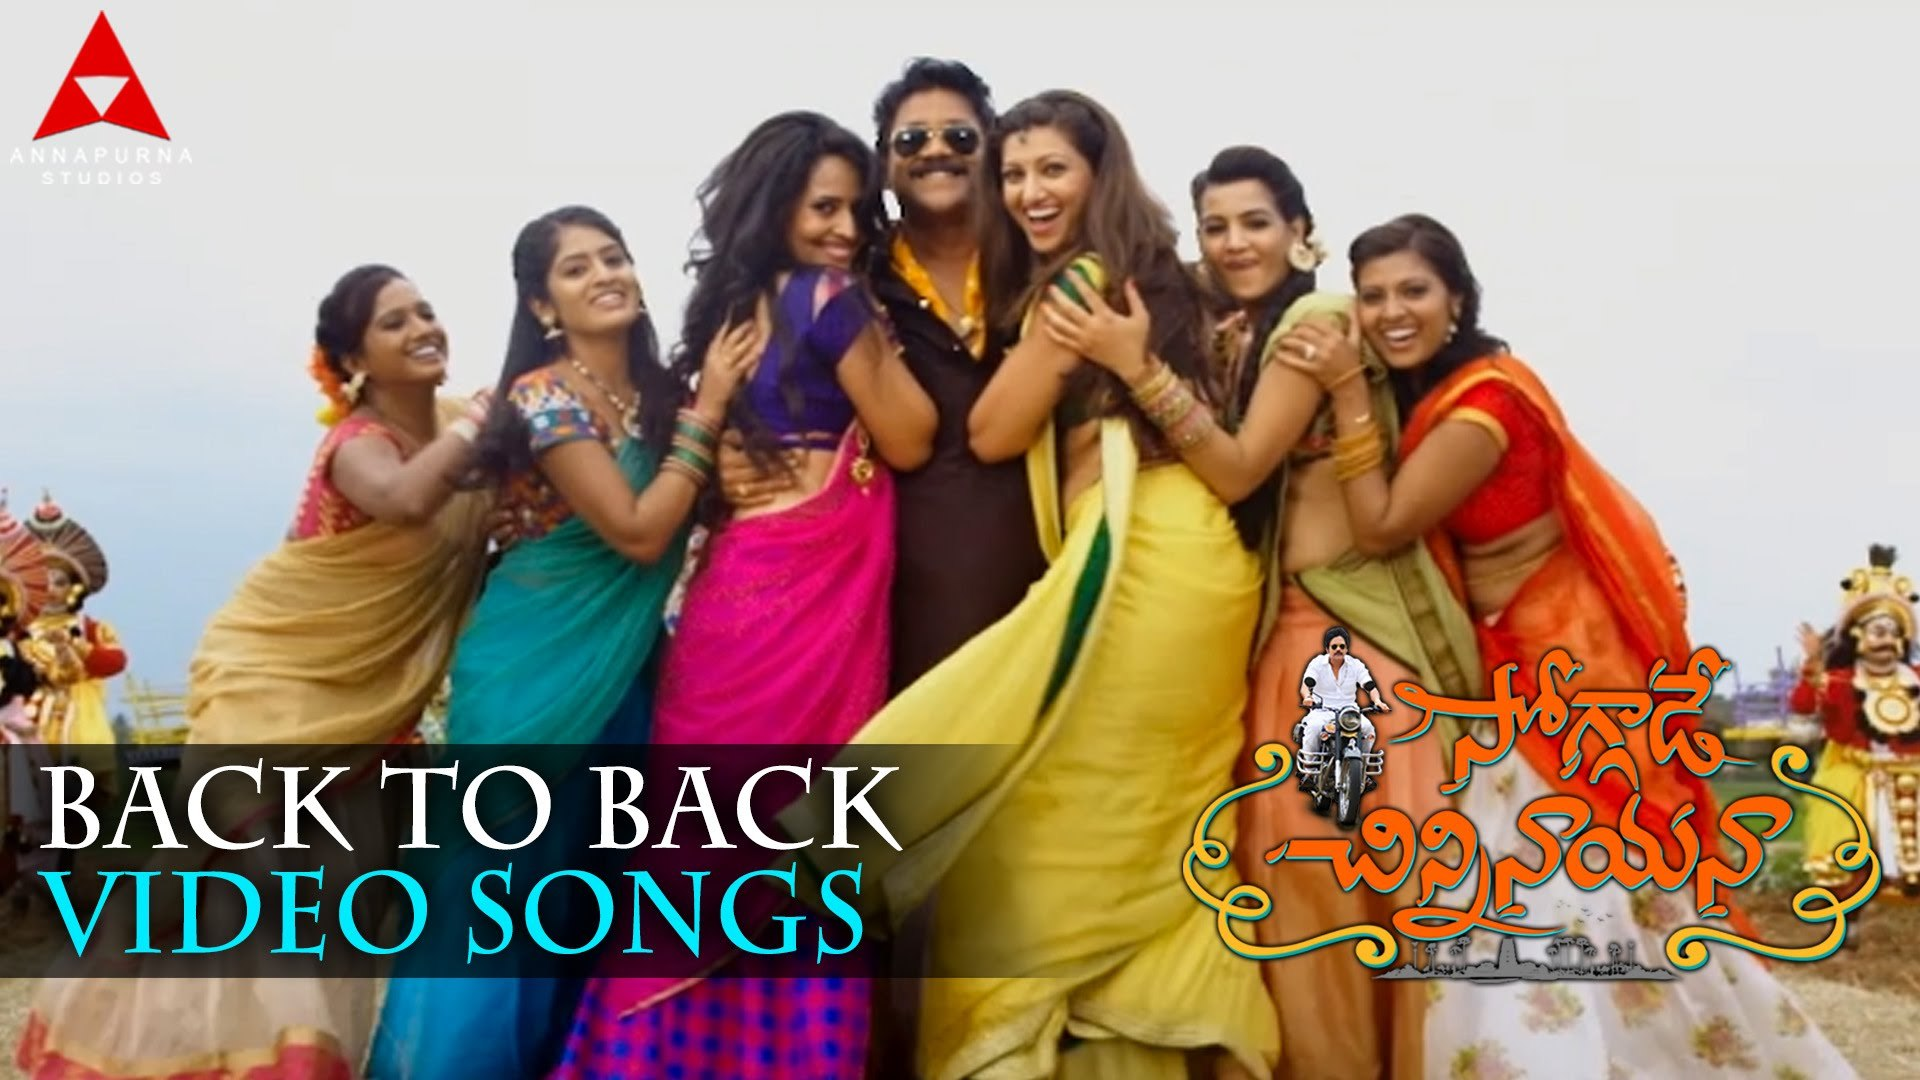 Soggade Chinni Nayana Back To Back Video Songs Nagarjuna Ramya Krishnan Lavanya Tripathi